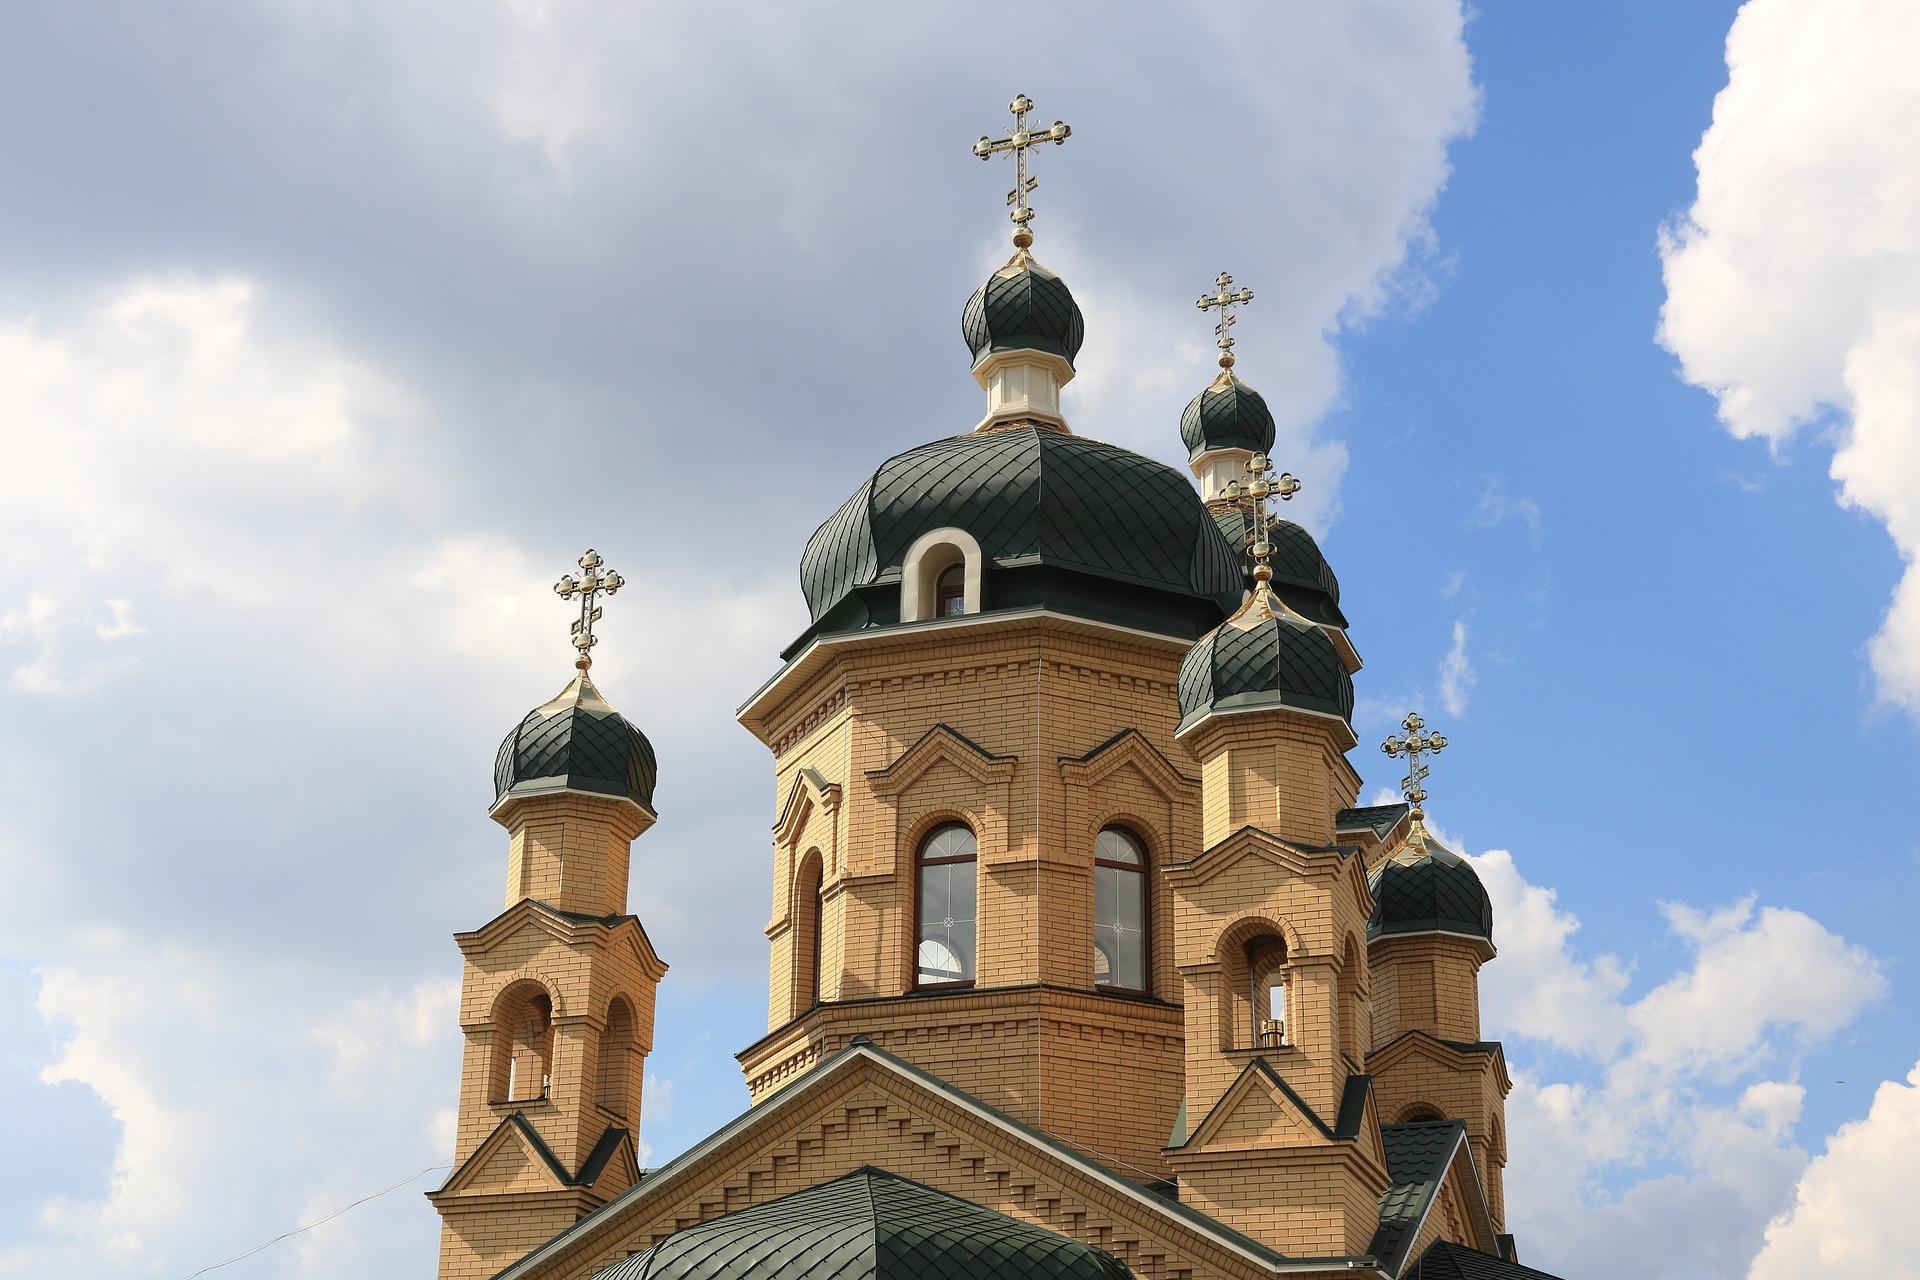 An Orthodox church in Ukraine